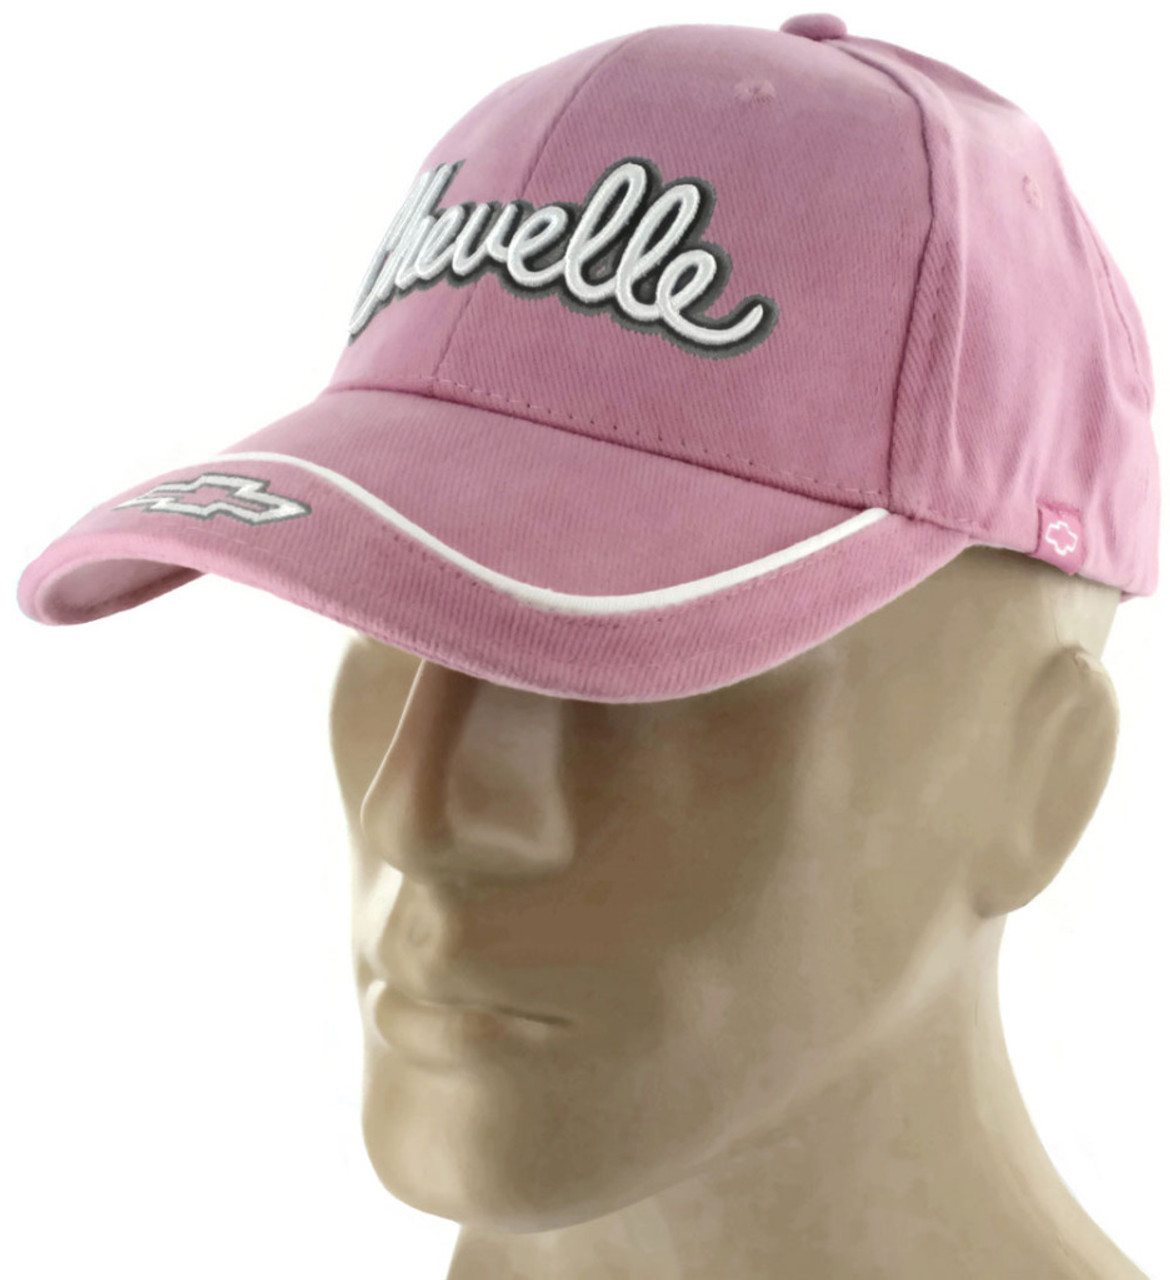 8863ac99f97 Chevrolet Chevelle SS Pink Baseball Cap Trucker Hat Snapback Yenko ...